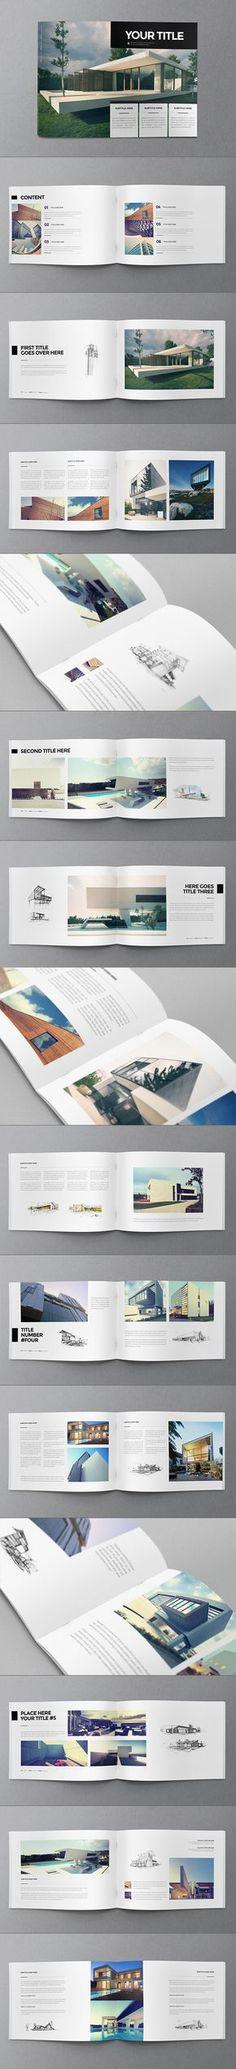 Our Portfolio Architecture 24 Pages A4  A5 Template \u2026 Brochure - architecture brochure template